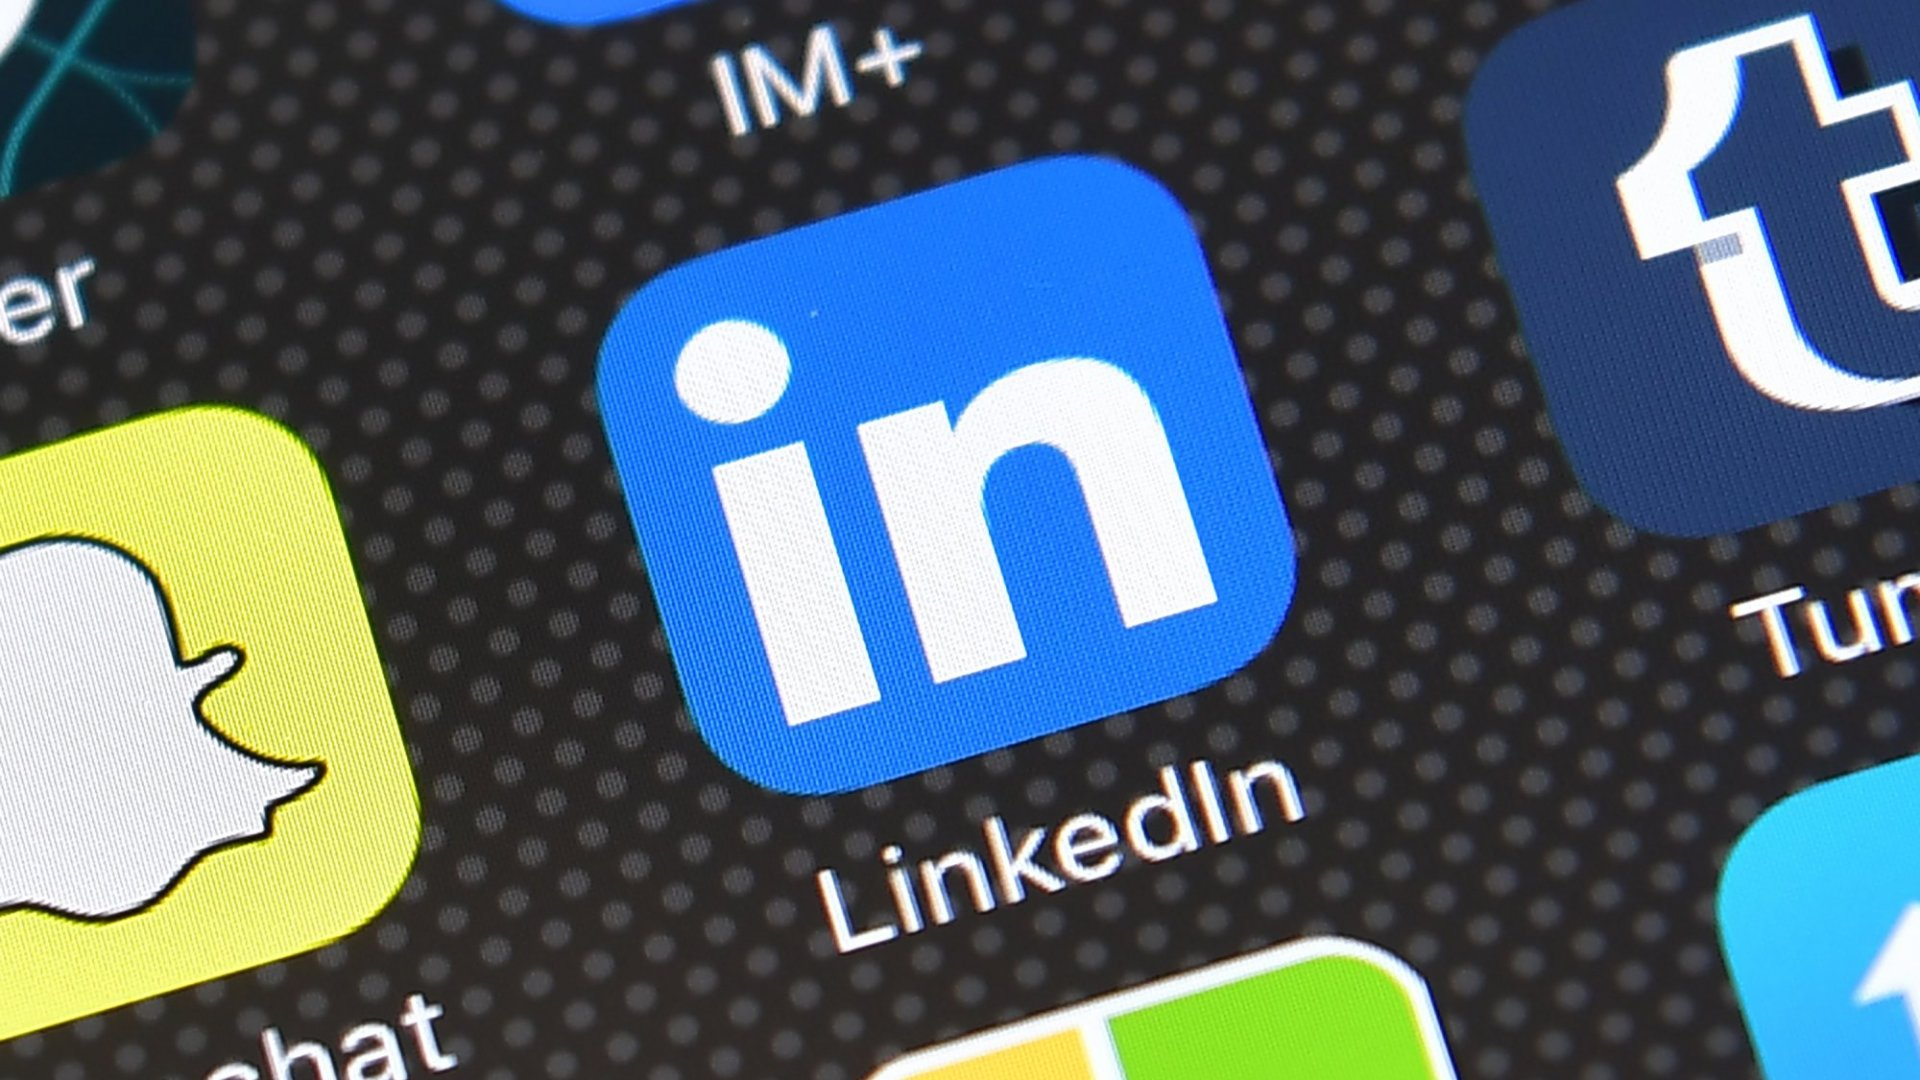 The Shocking Statistic That Will Make You Rethink LinkedIn